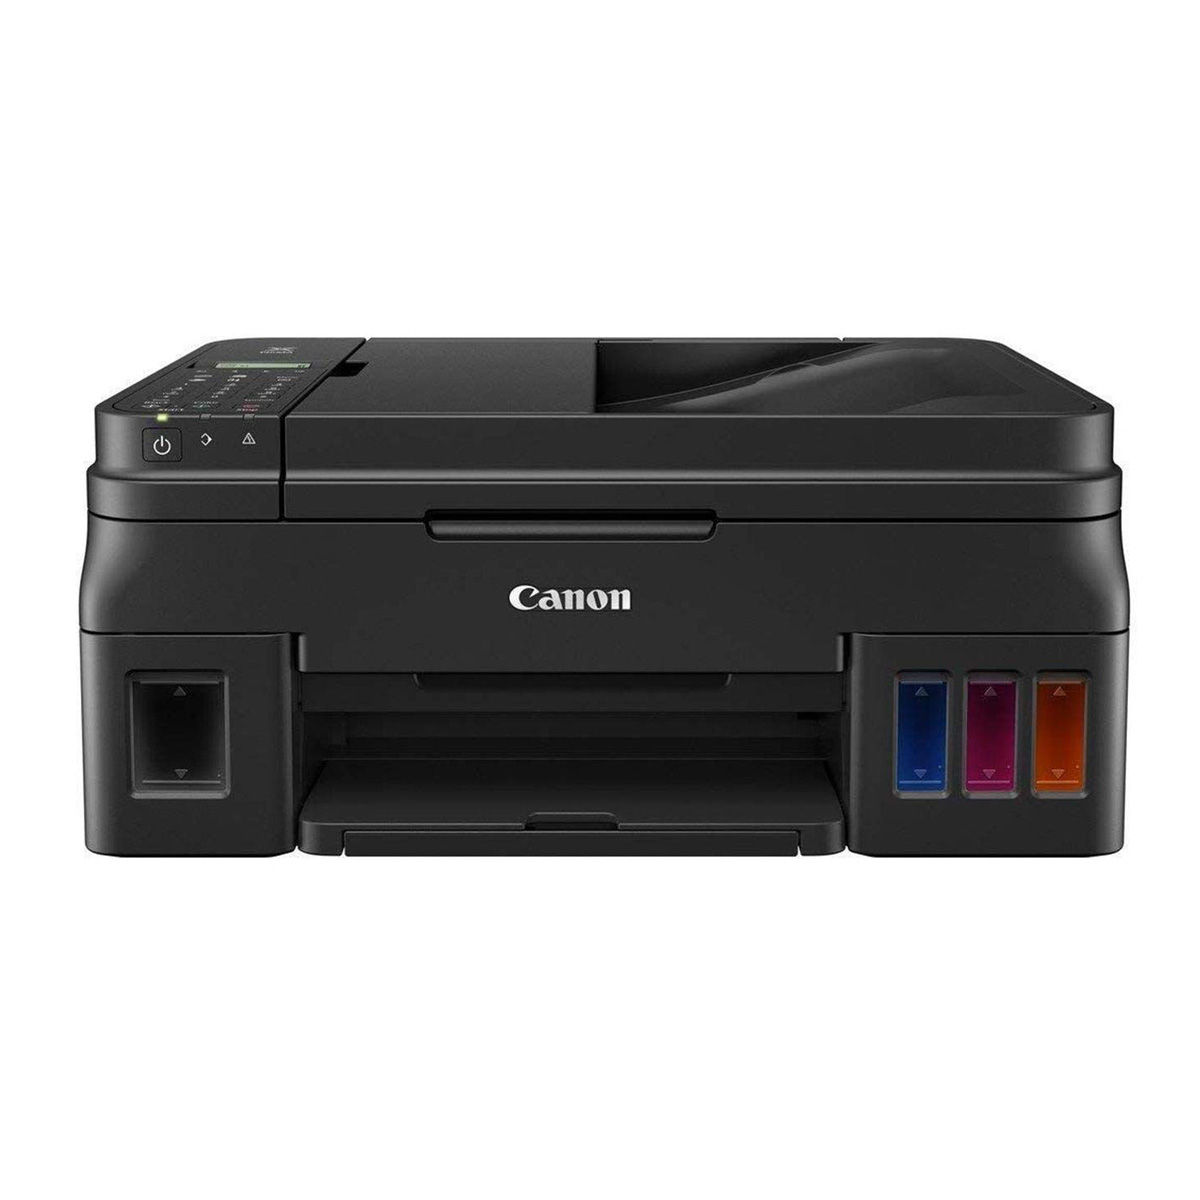 कैनन Pixma G4010 Ink Tank Printer